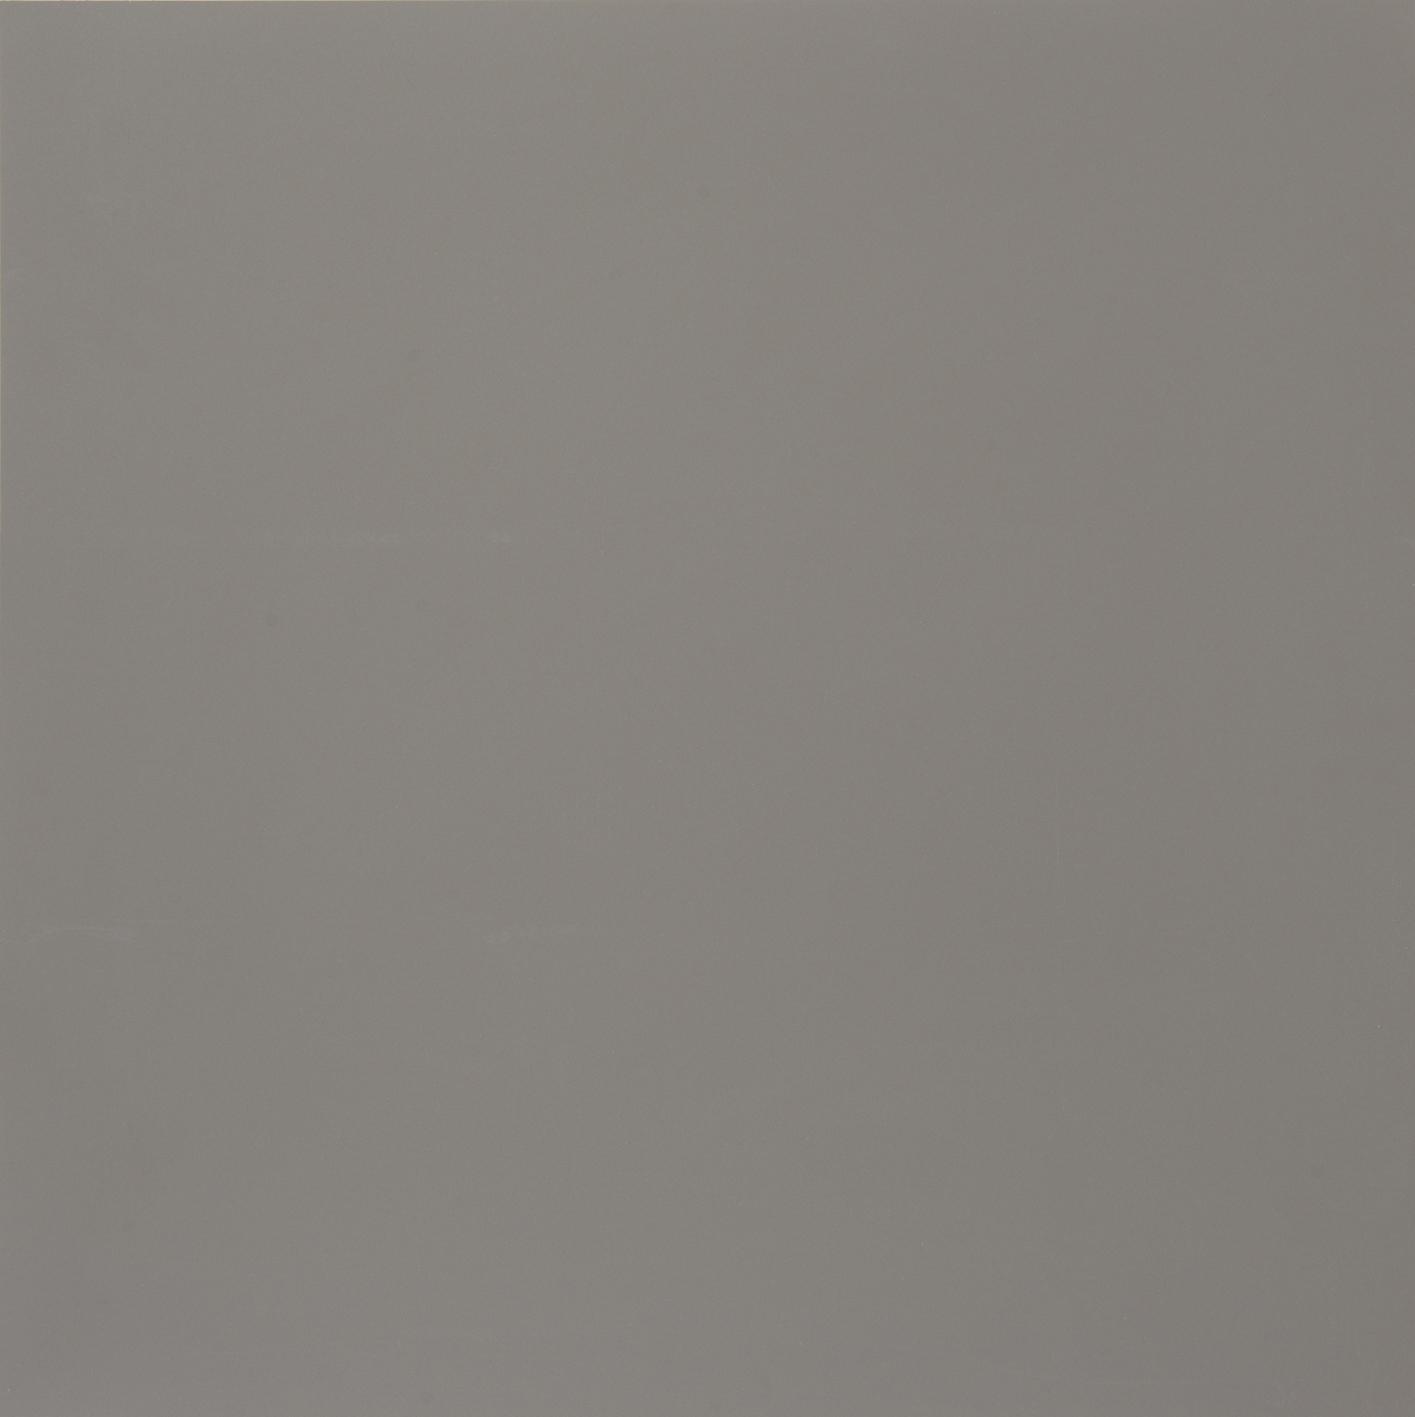 płytki szare gresowe 30x30 Aparici Neutral Gris Natural